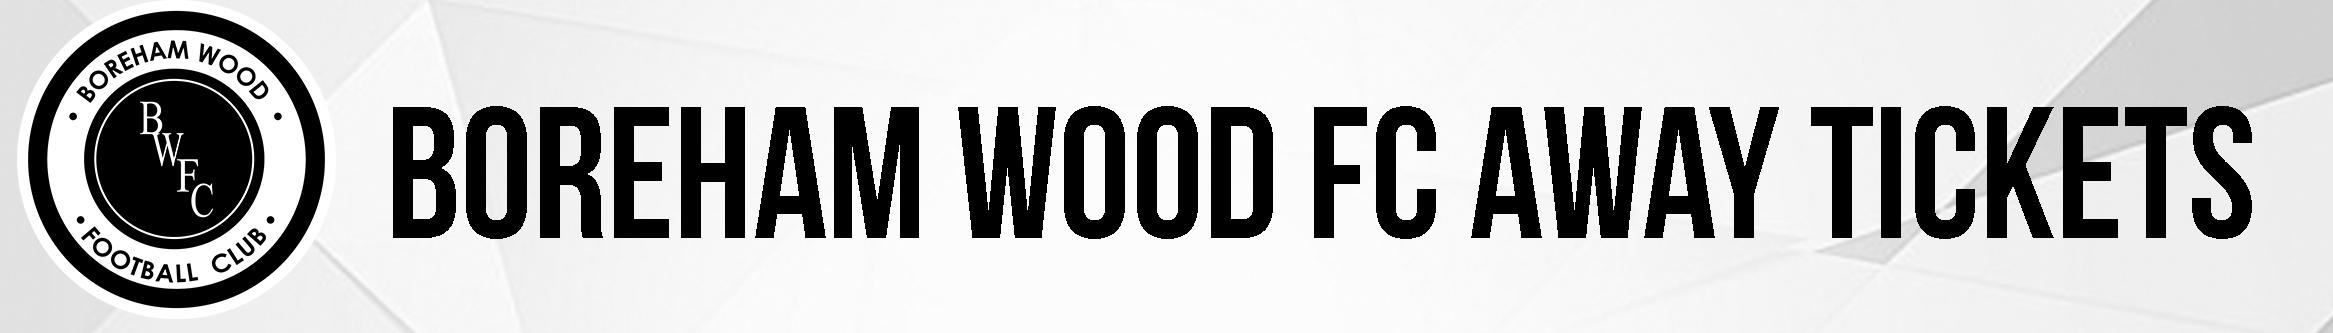 Boreham Wood FC Away Tickets